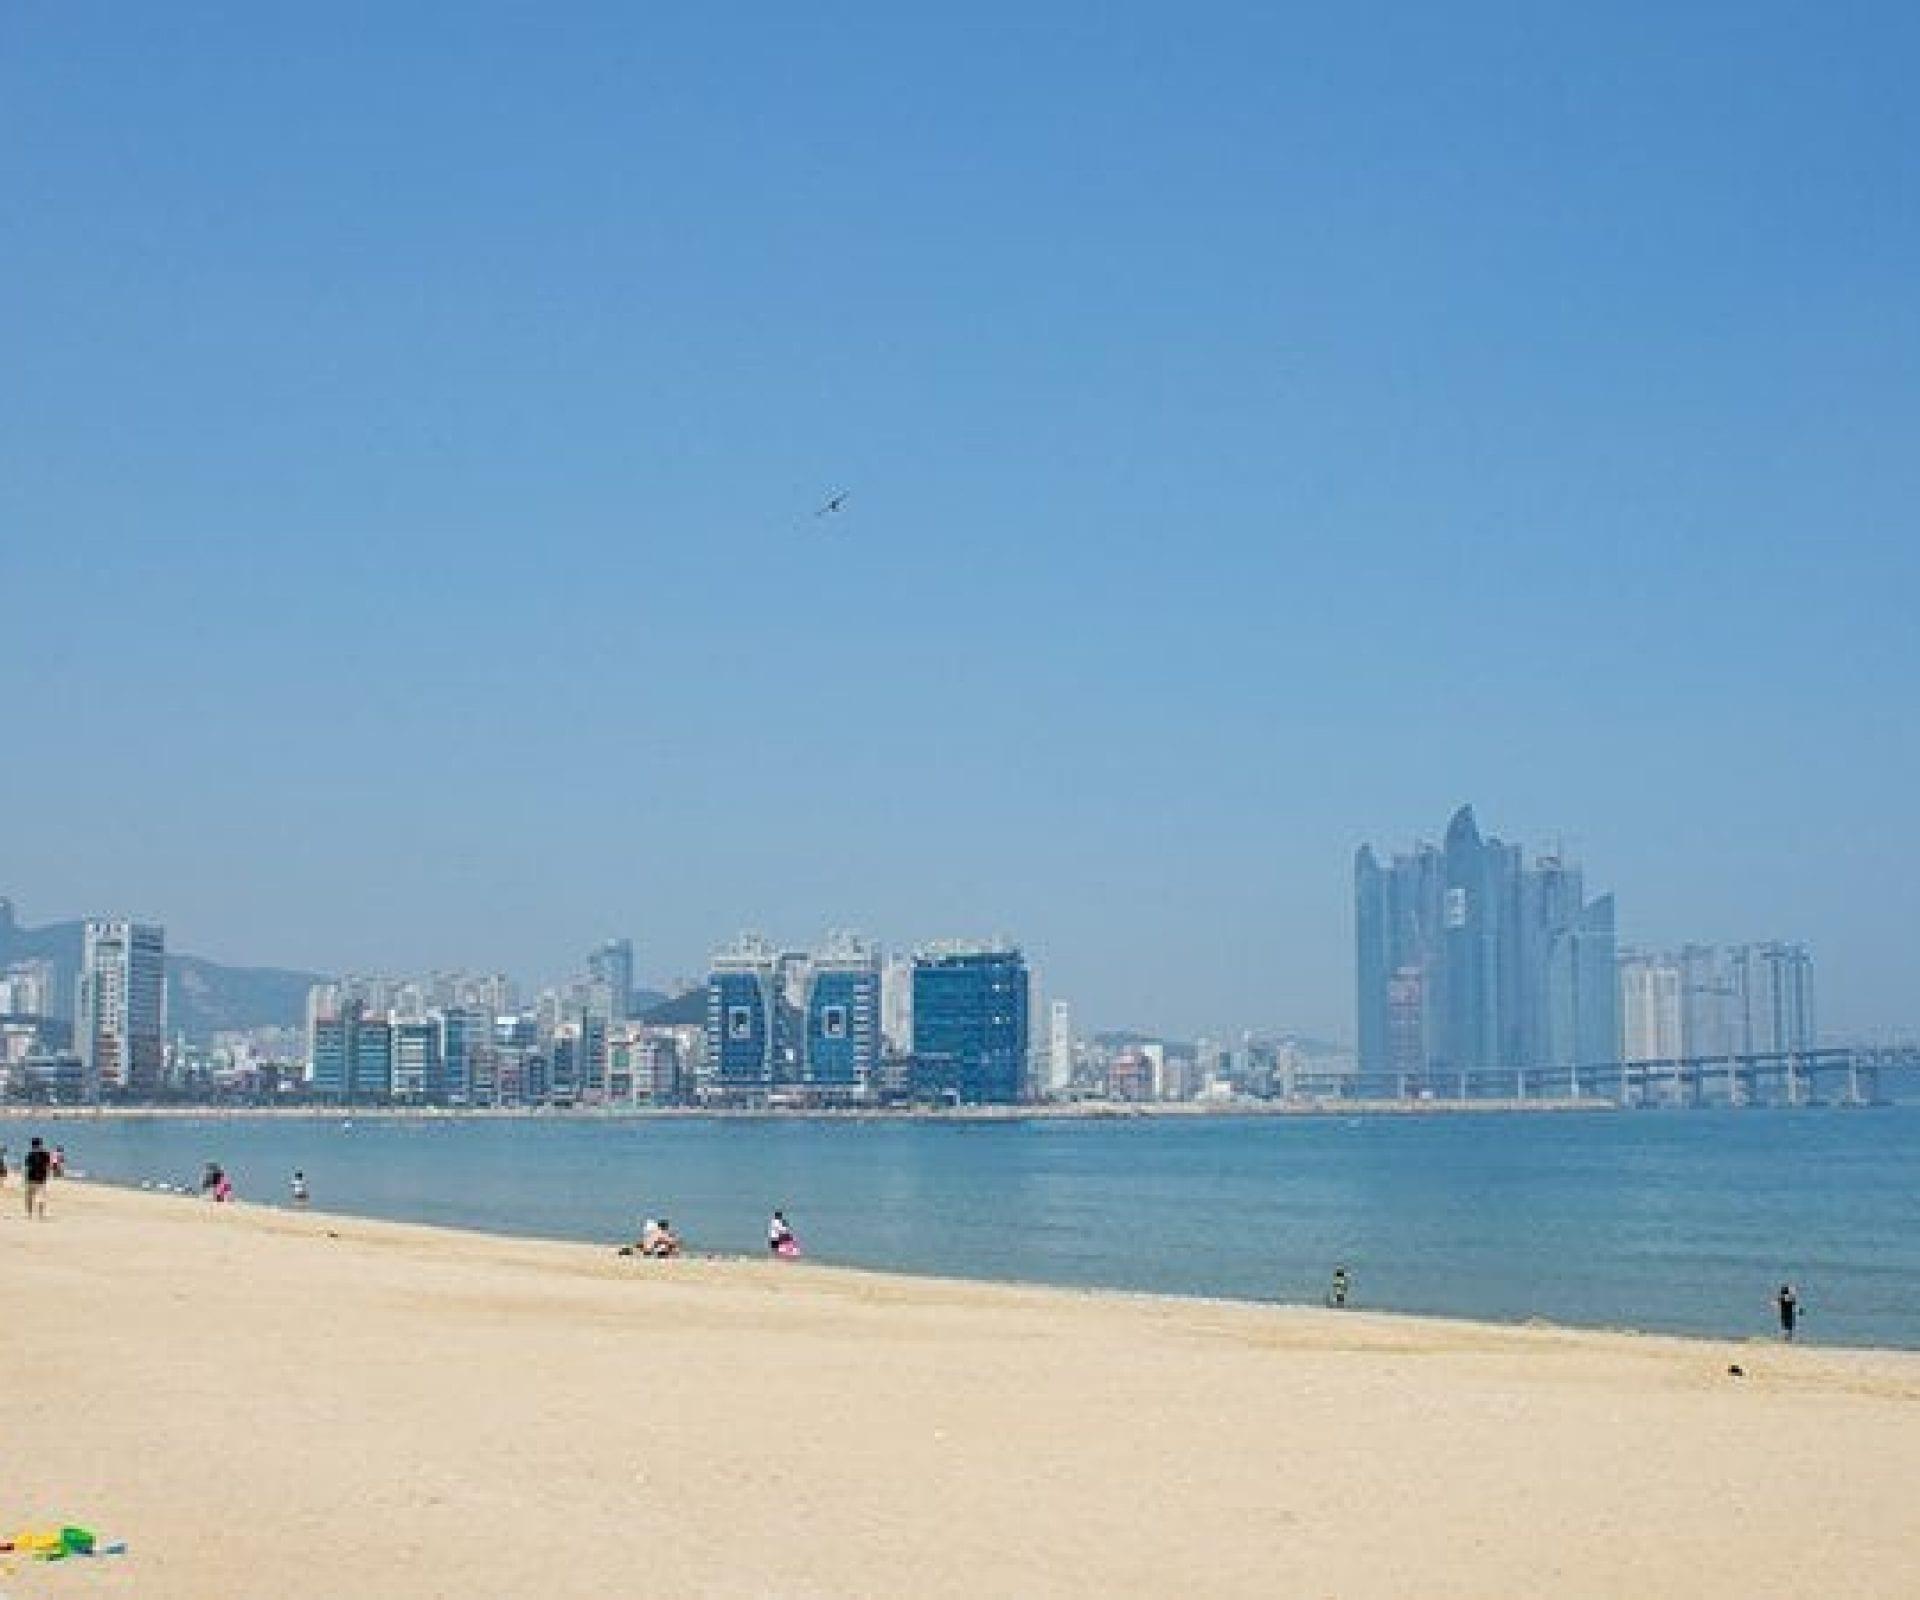 Gwangalli Beach | Suyeong-gu, Busan